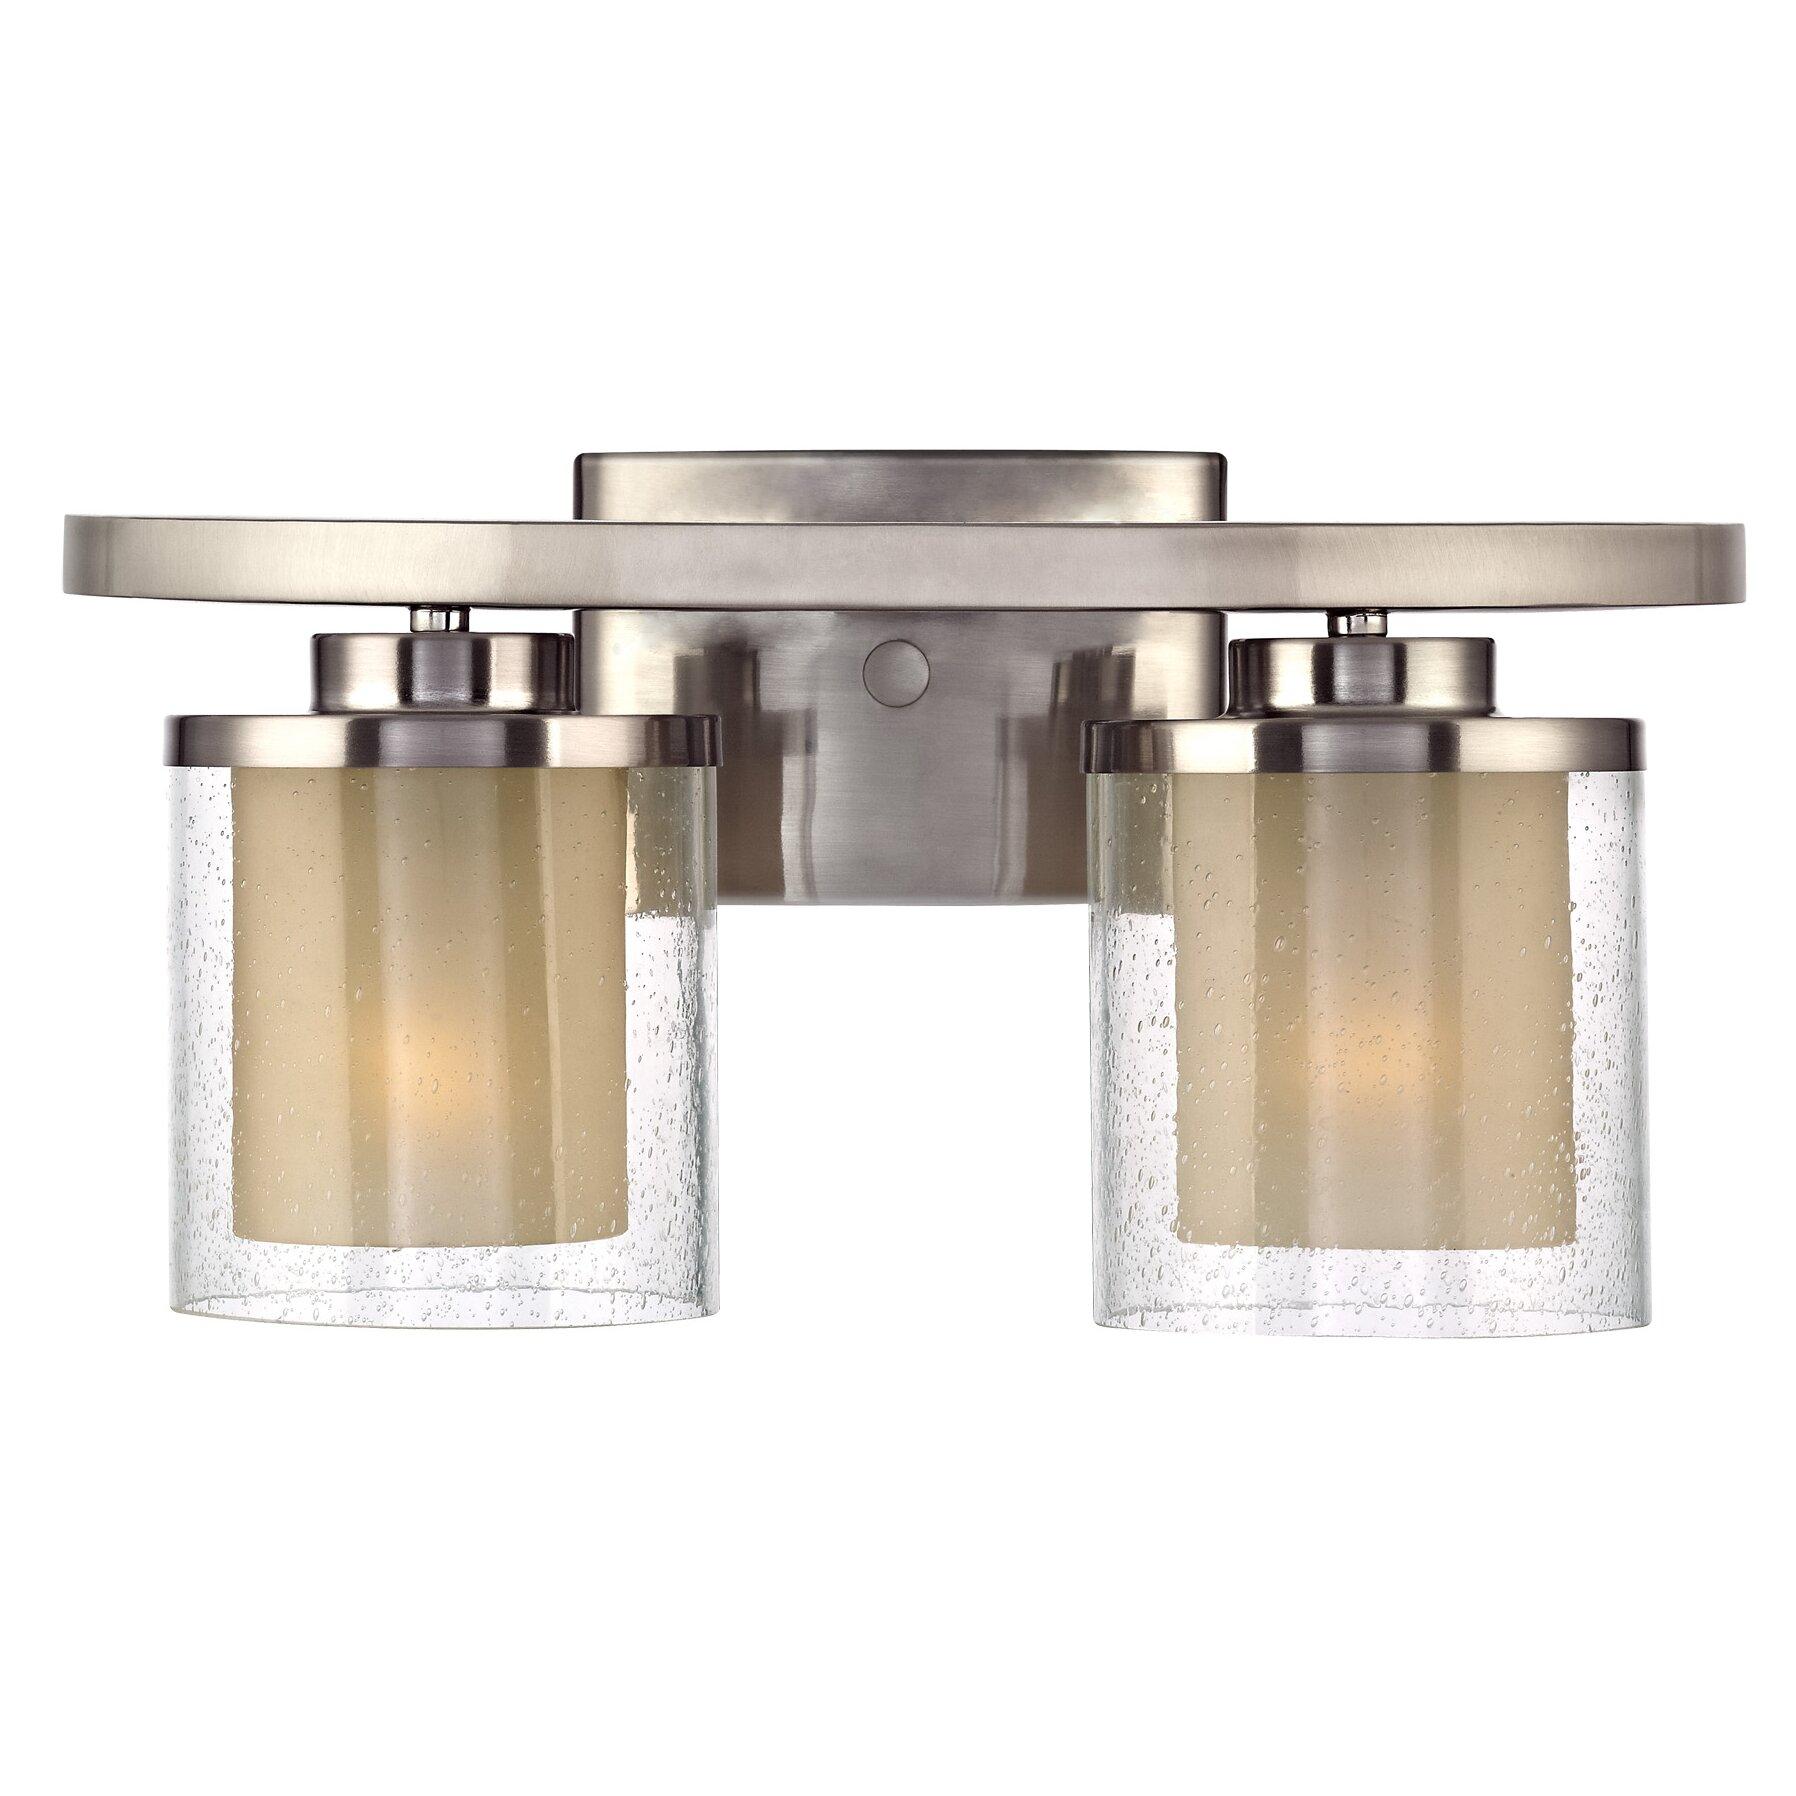 Bathroom Vanity Lights Design Ideas: Dolan Designs Horizon 2 Light Bath Vanity Light & Reviews